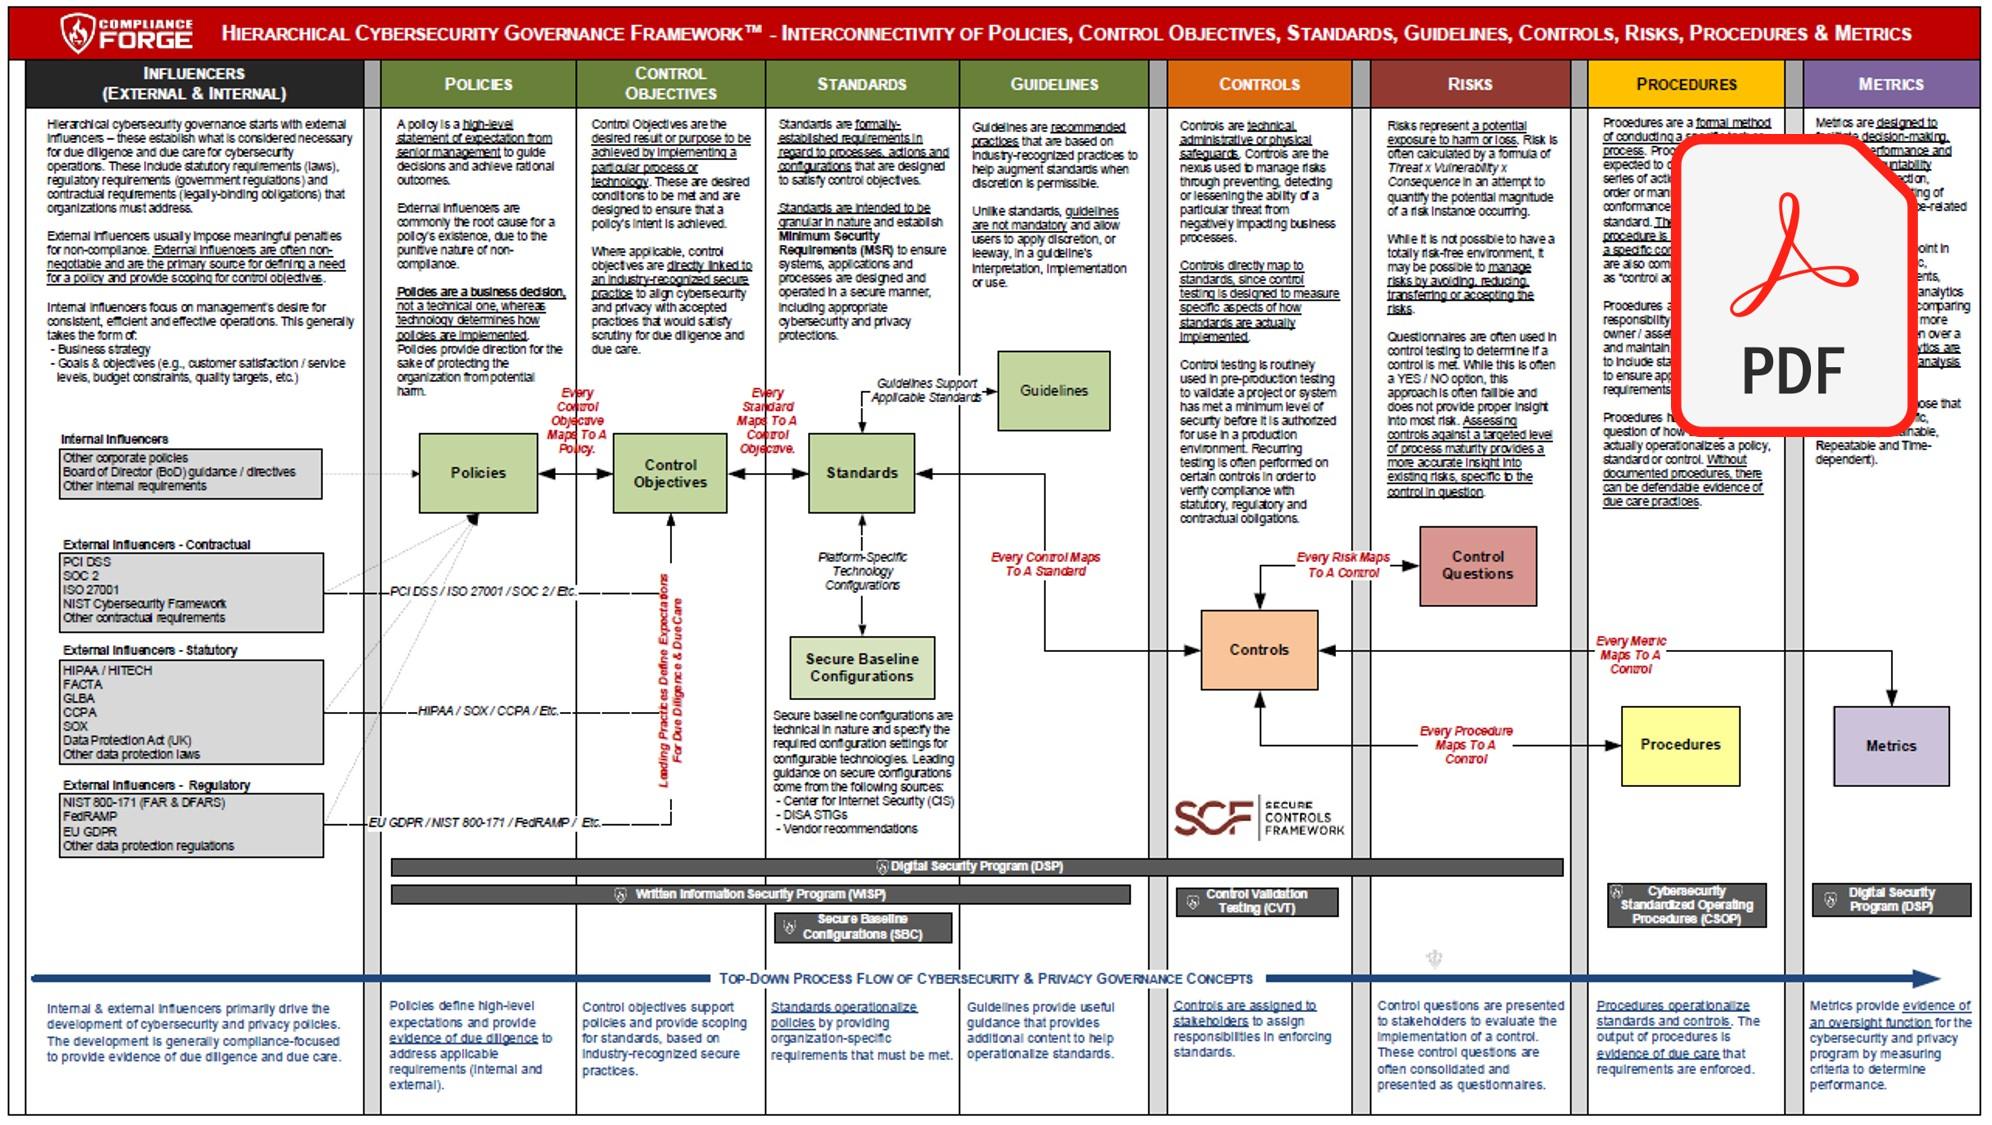 2020-hierarchical-cybersecurity-governance-framework.jpg